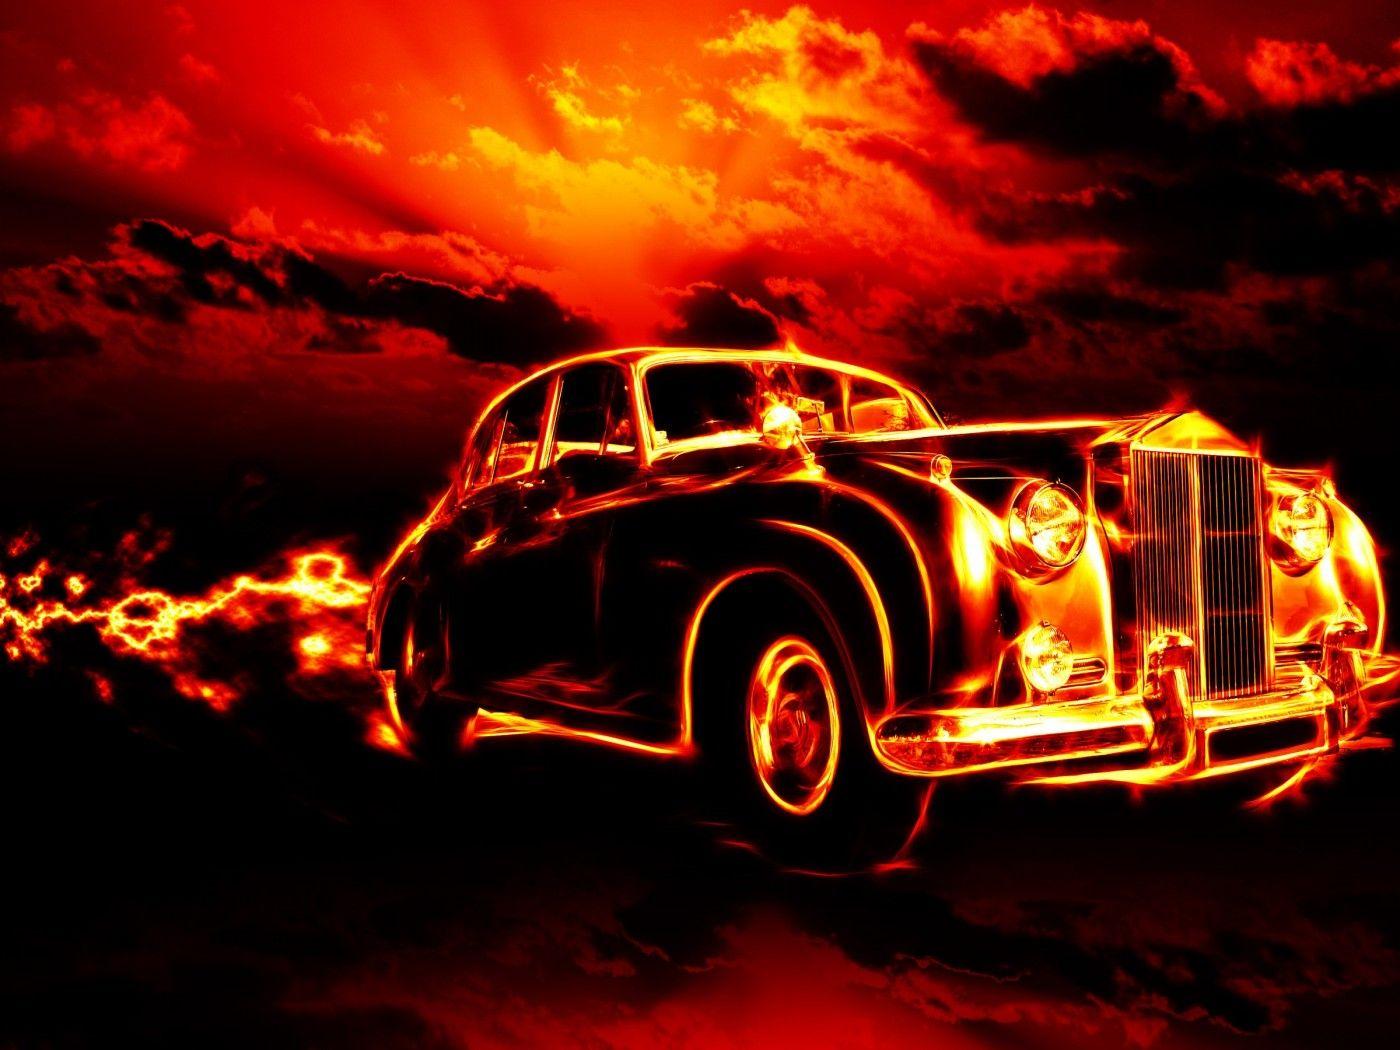 Vintage Car In Fire Hd Wallpaper Download High Definition Wallpaper Of Vintage Car Wallpapers Wallpaper Pictures Desktop Wallpaper